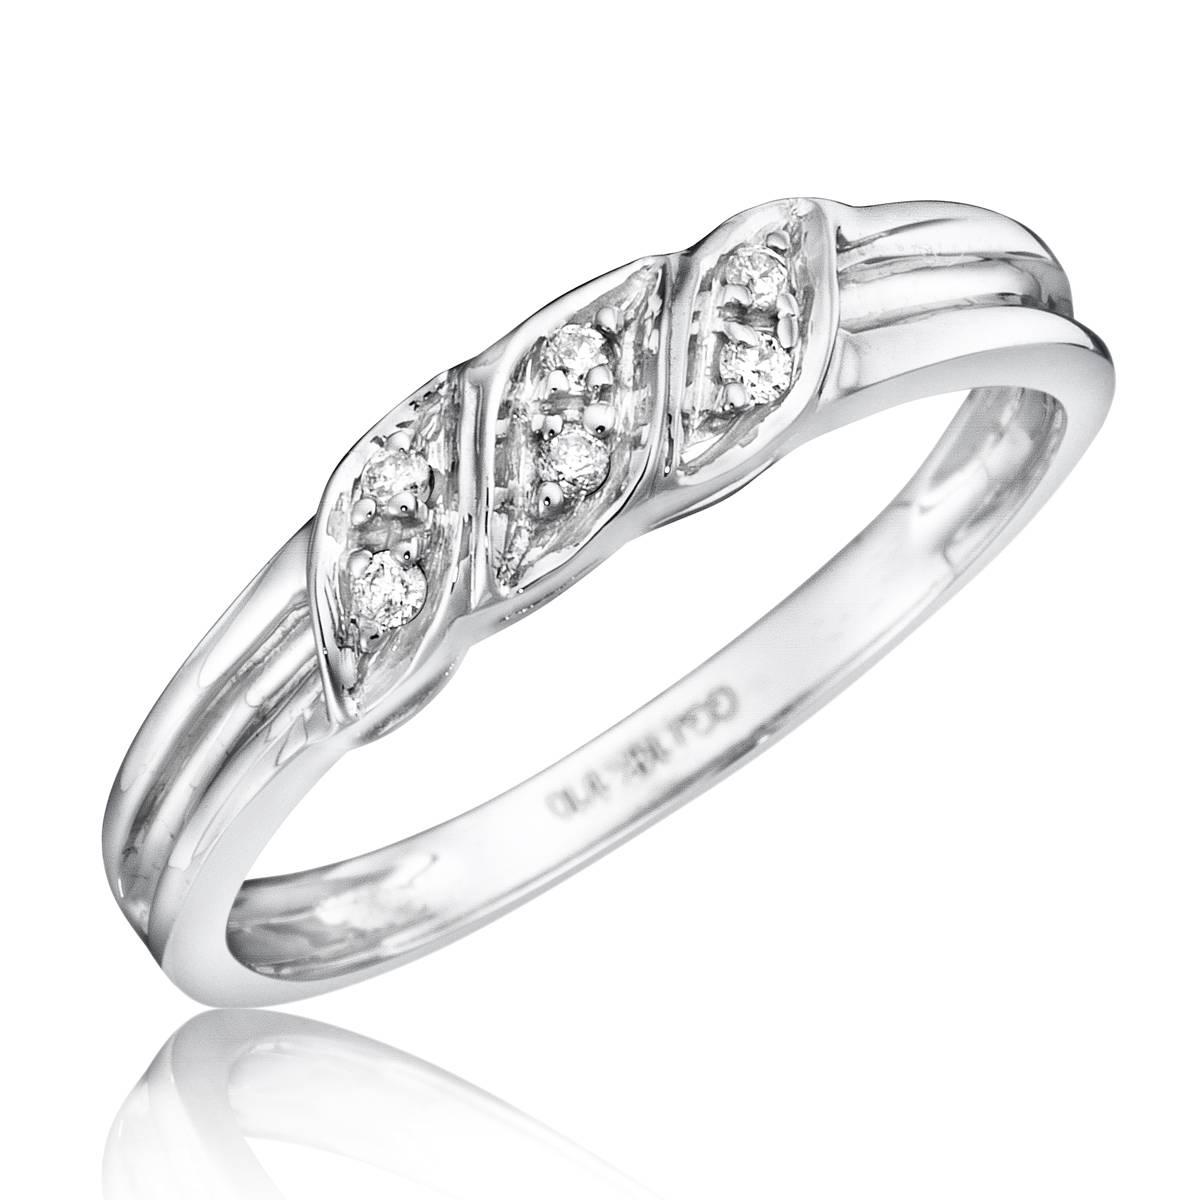 1/15 Carat T.w. Diamond Women's Wedding Ring 10K White Gold Within Ladies White Gold Diamond Wedding Bands (Gallery 1 of 15)